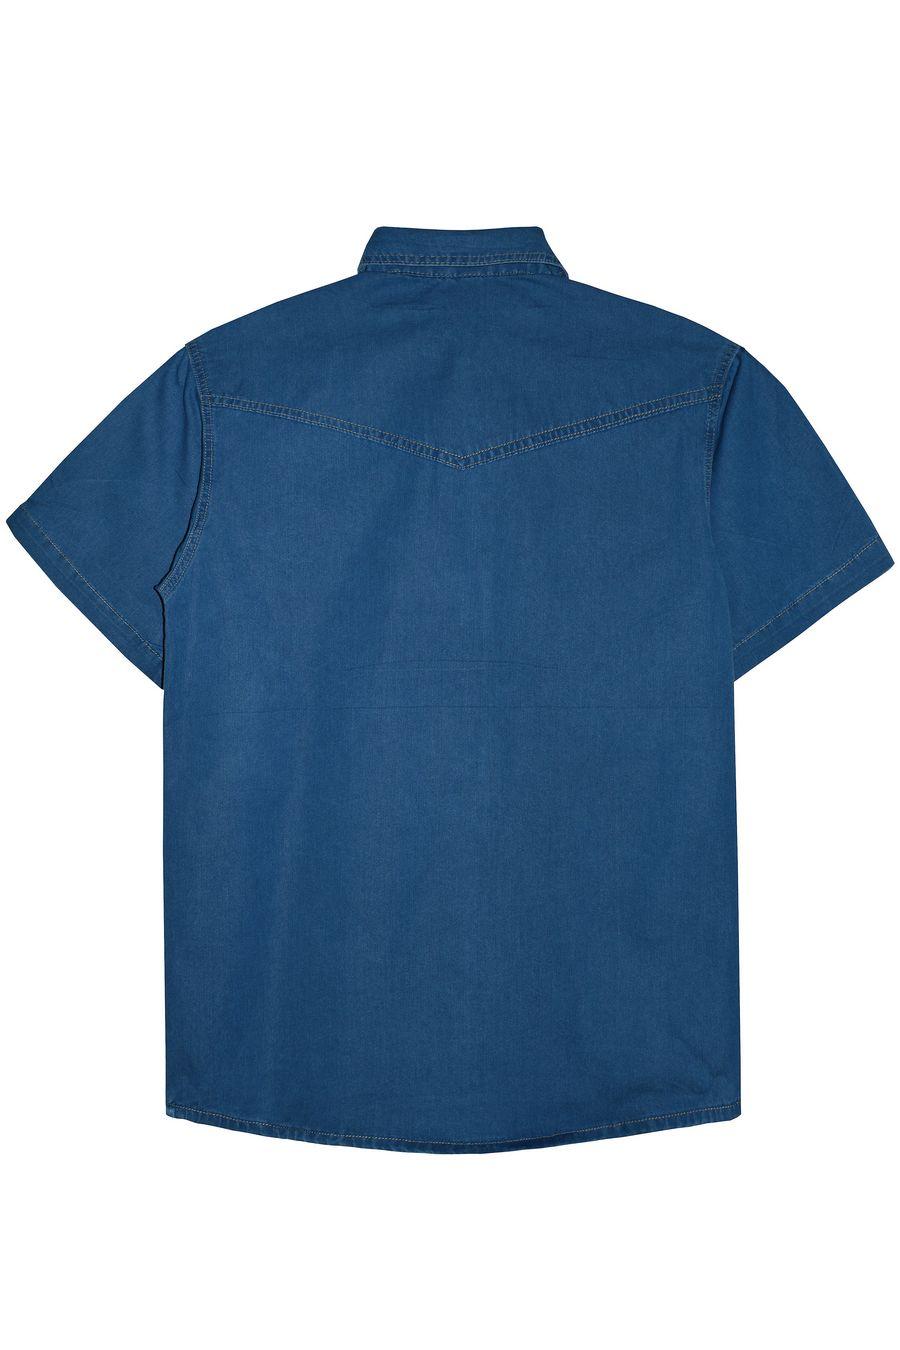 Рубашка мужская Vicucs 728E/CT-321-19 (XL-5XL) - фото 2